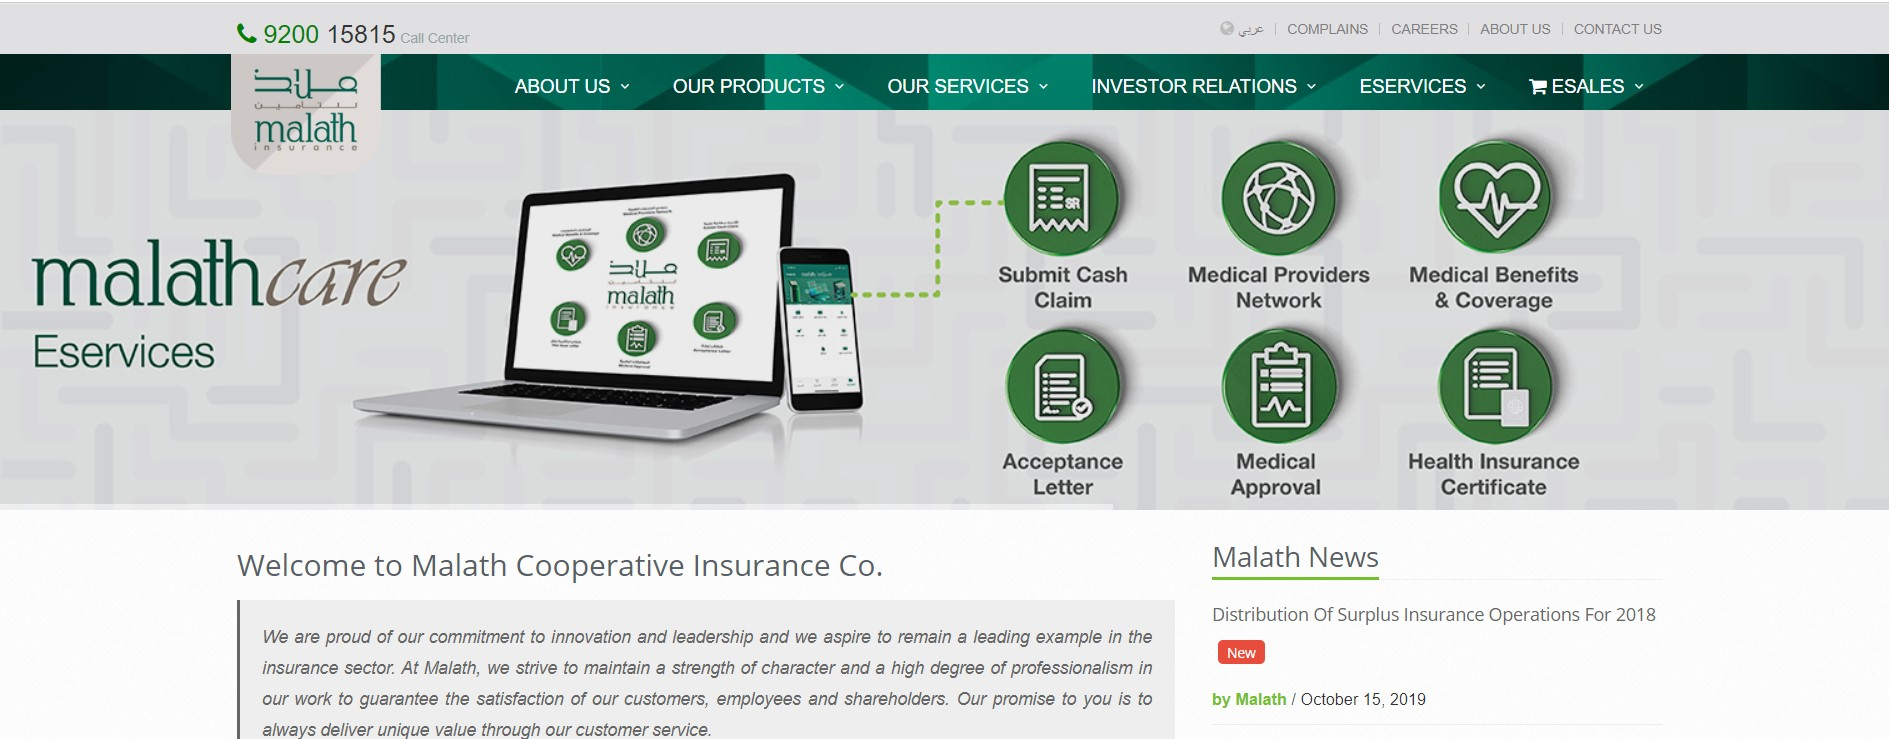 Malath Cooperative Insurance Co.